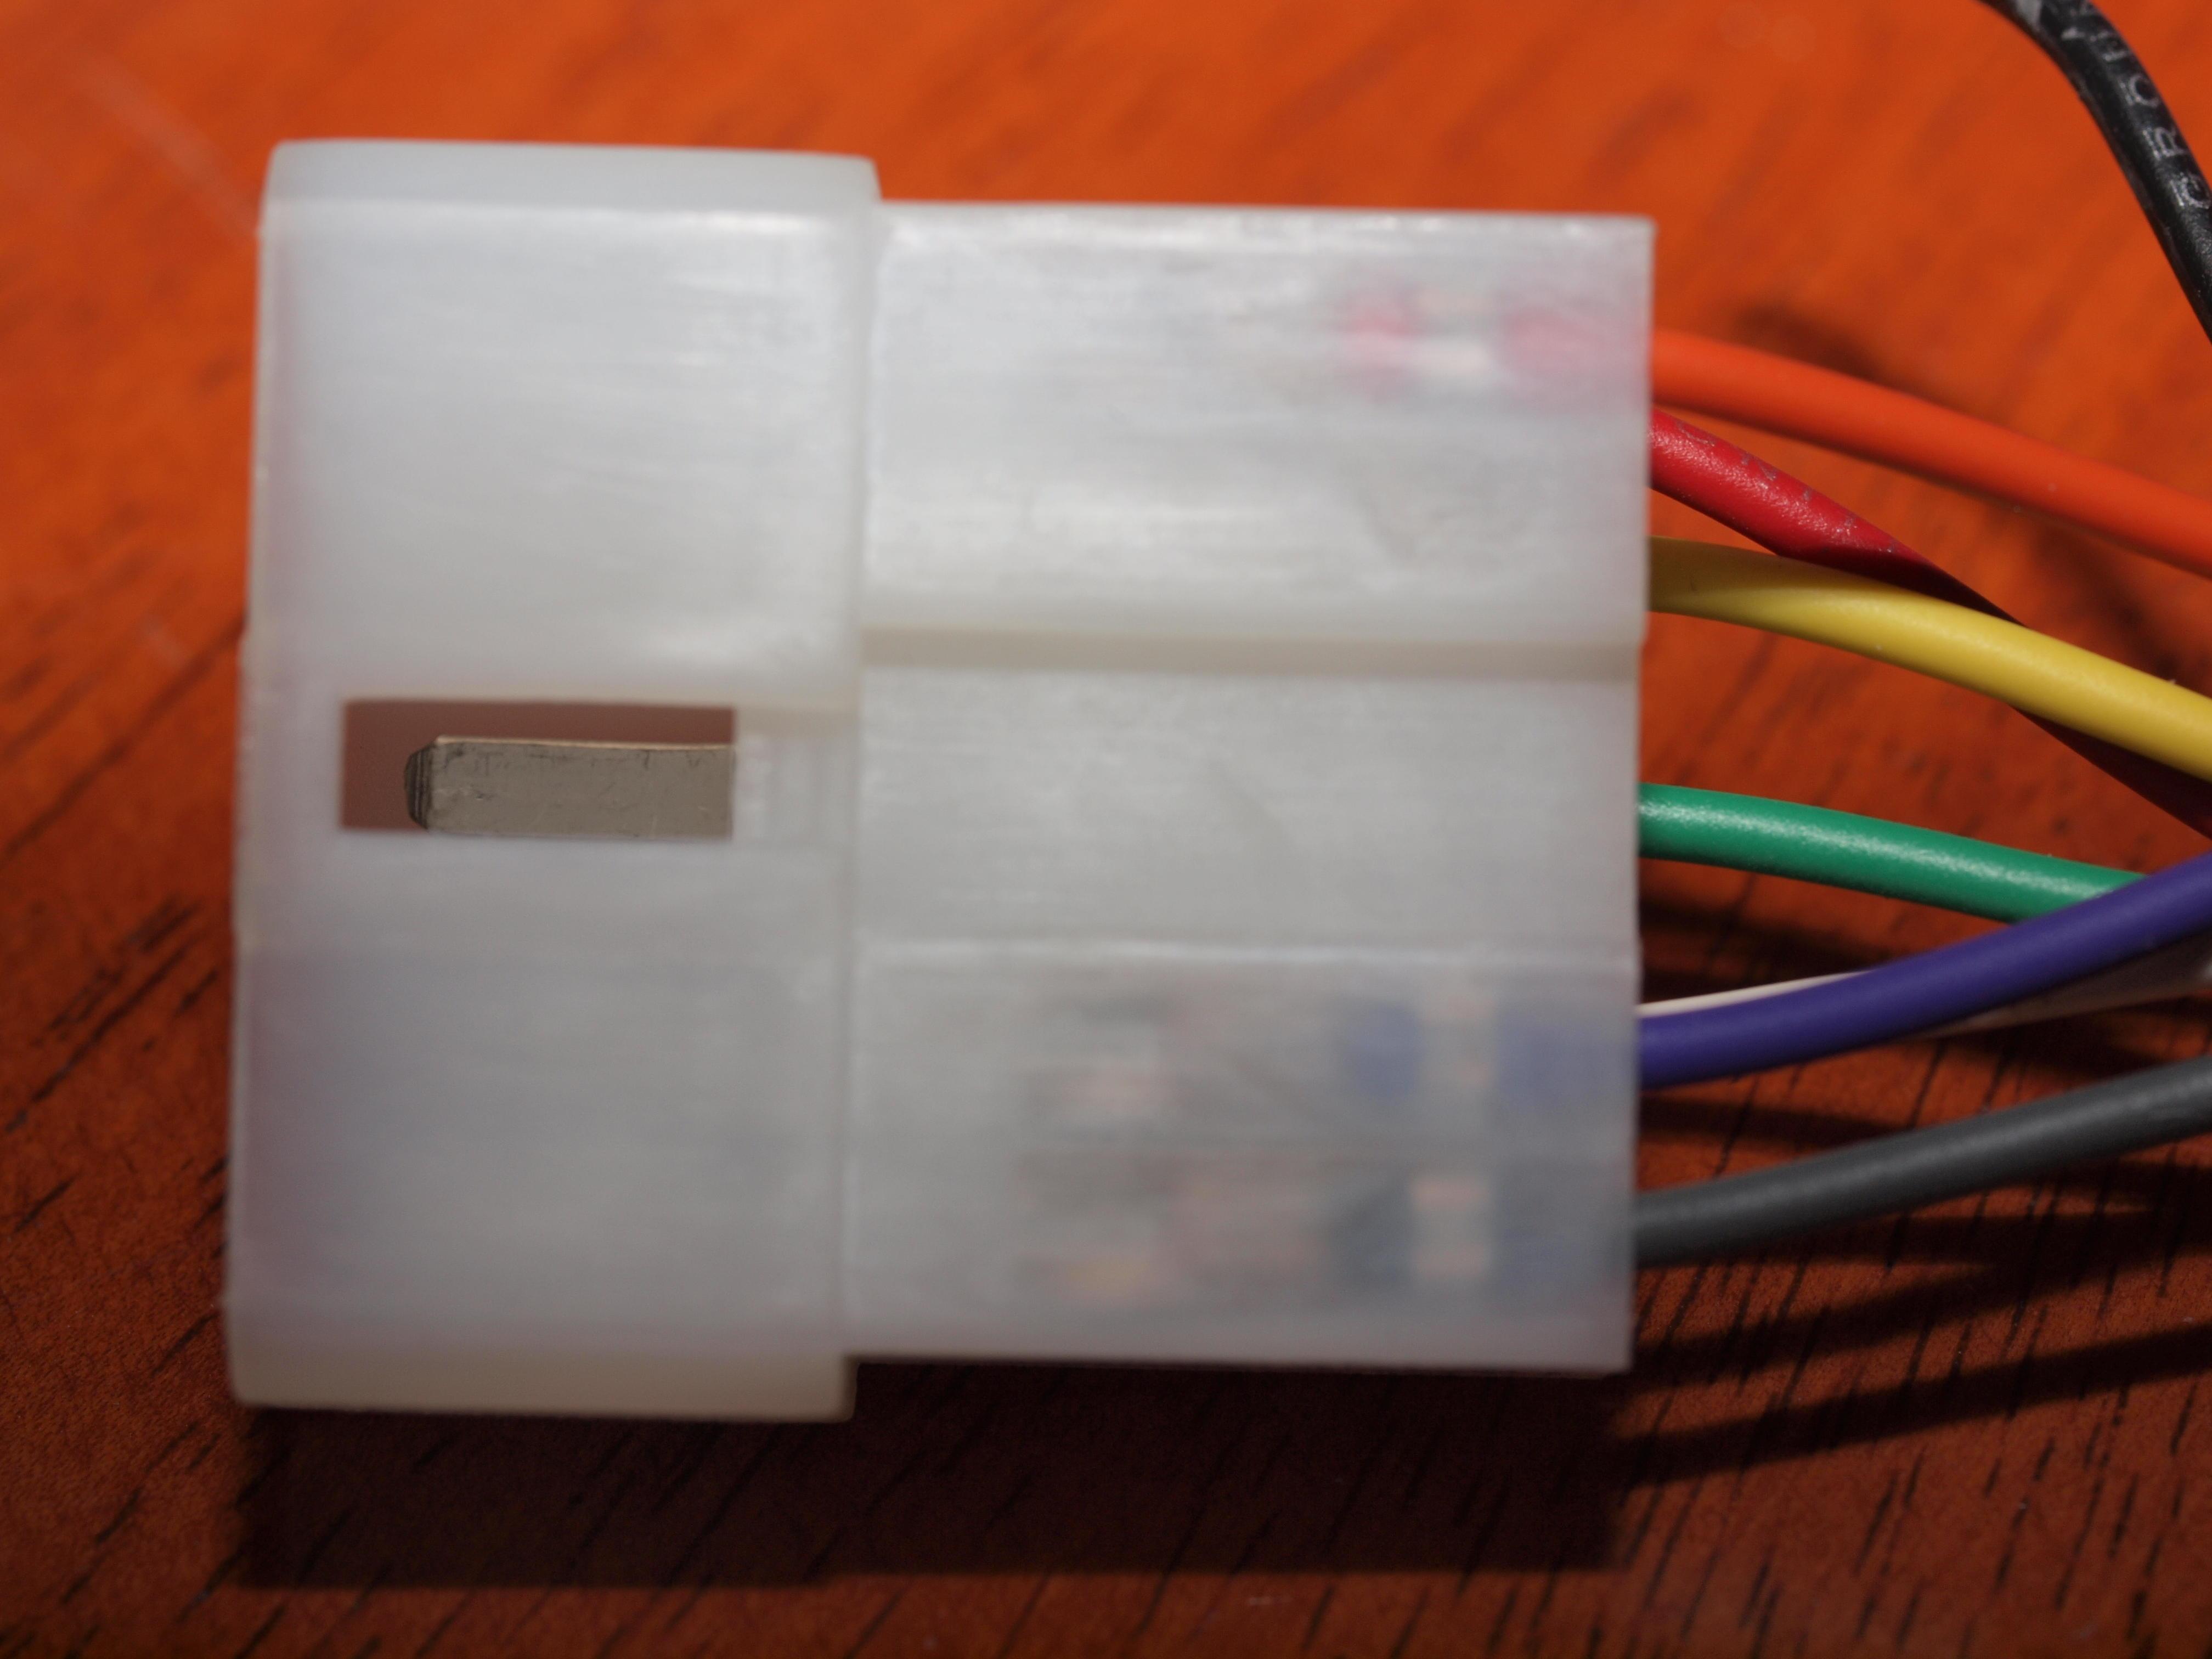 Car-plug-1-cables.jpeg